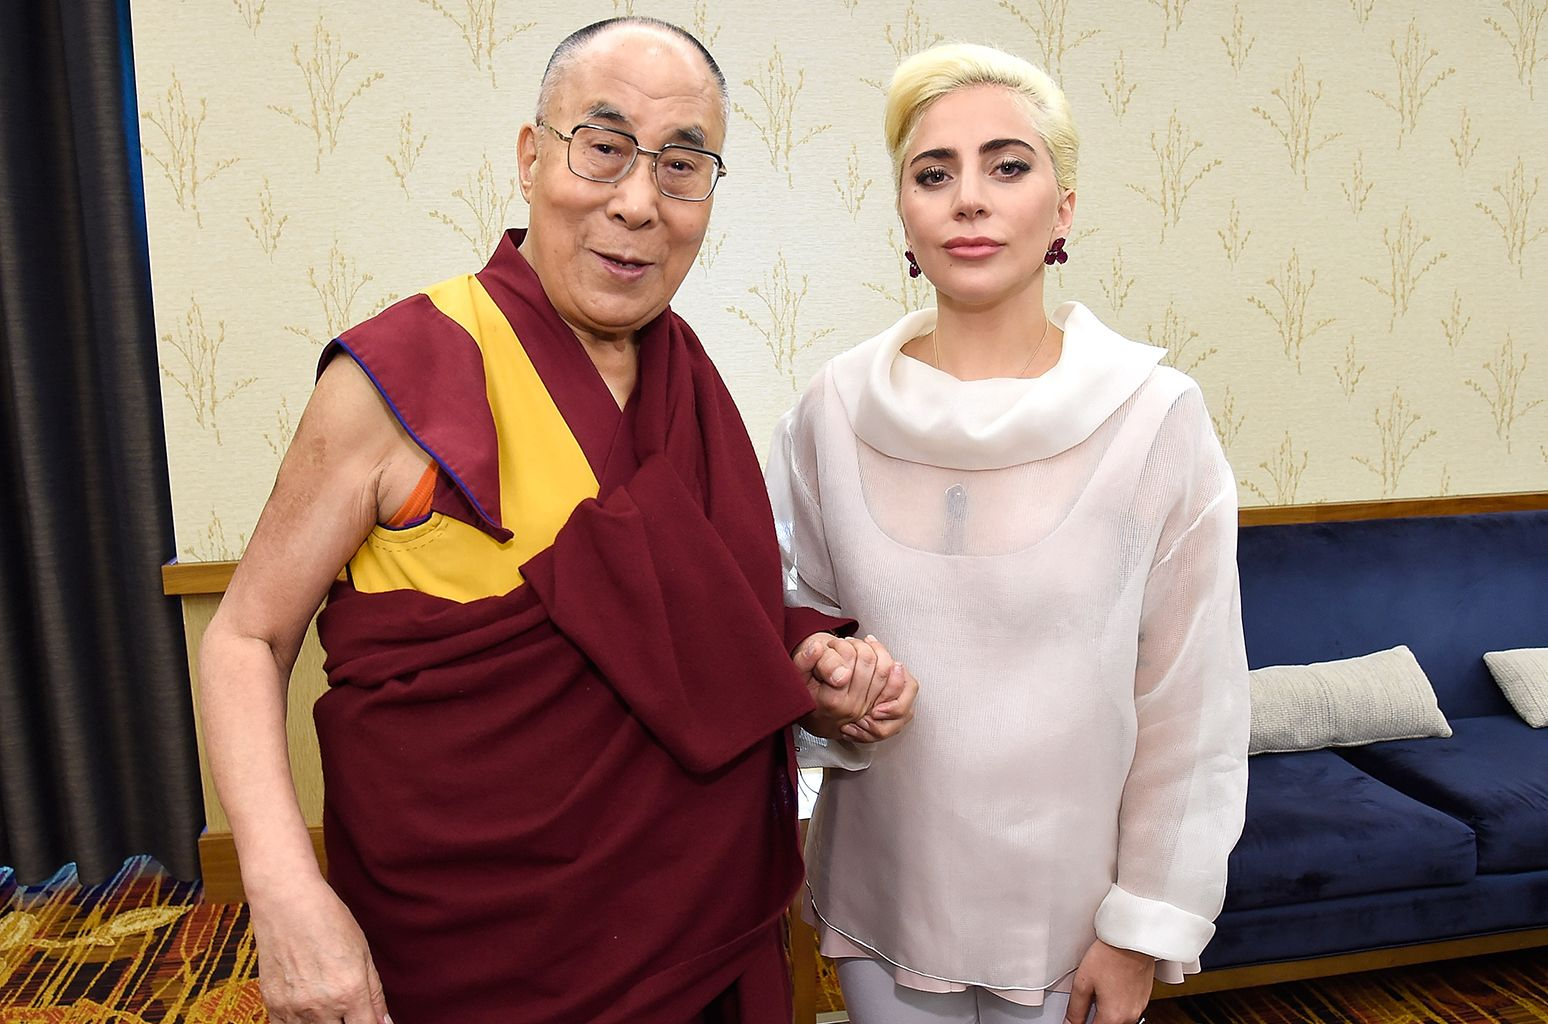 Lady Gaga's Dalai Lama Meeting Generates Backlash in China